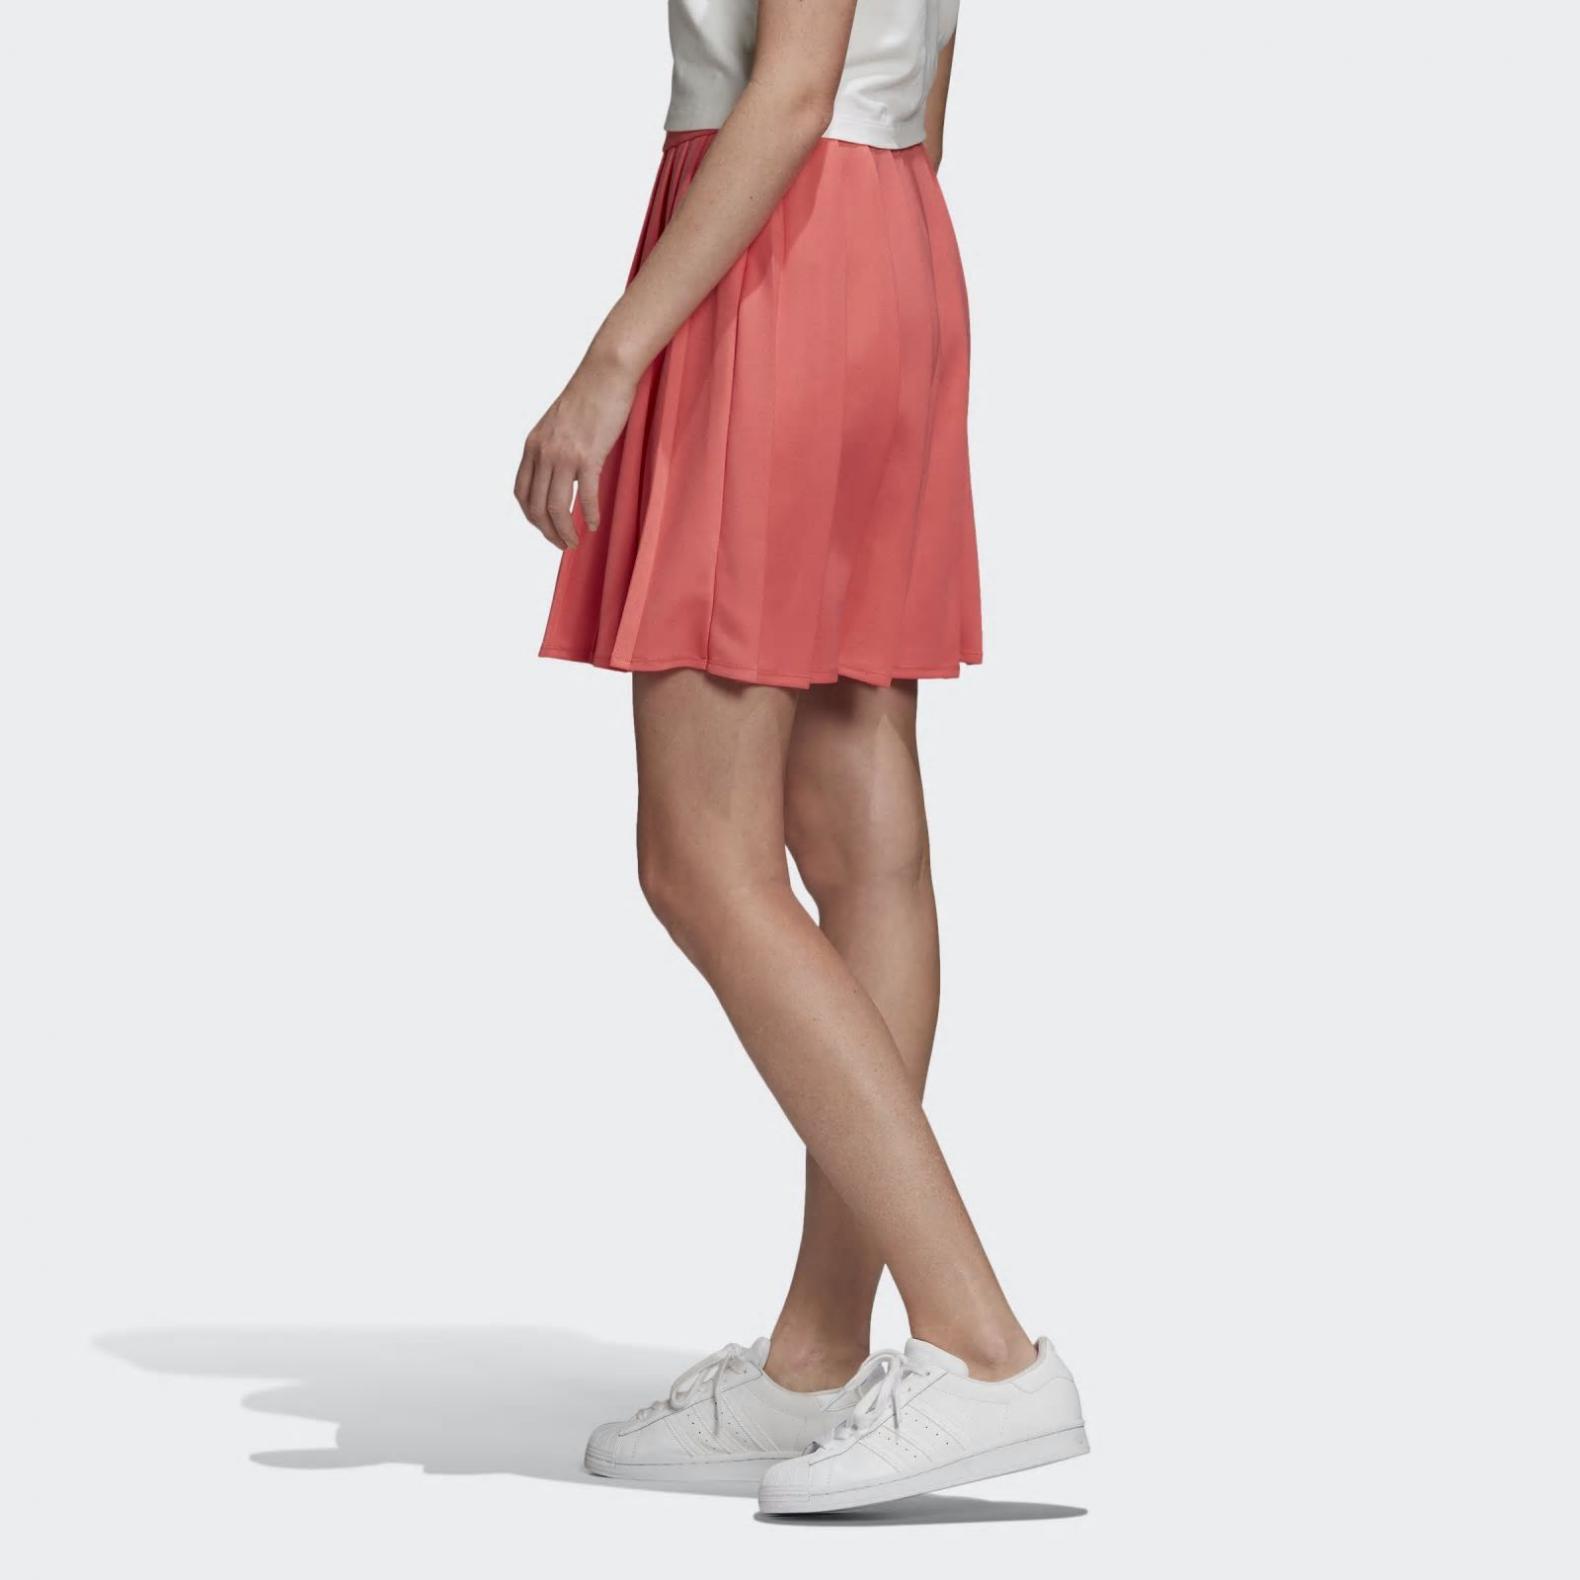 Adidas Originals Röcke  Kleider  Rock Magic Pink  Damen